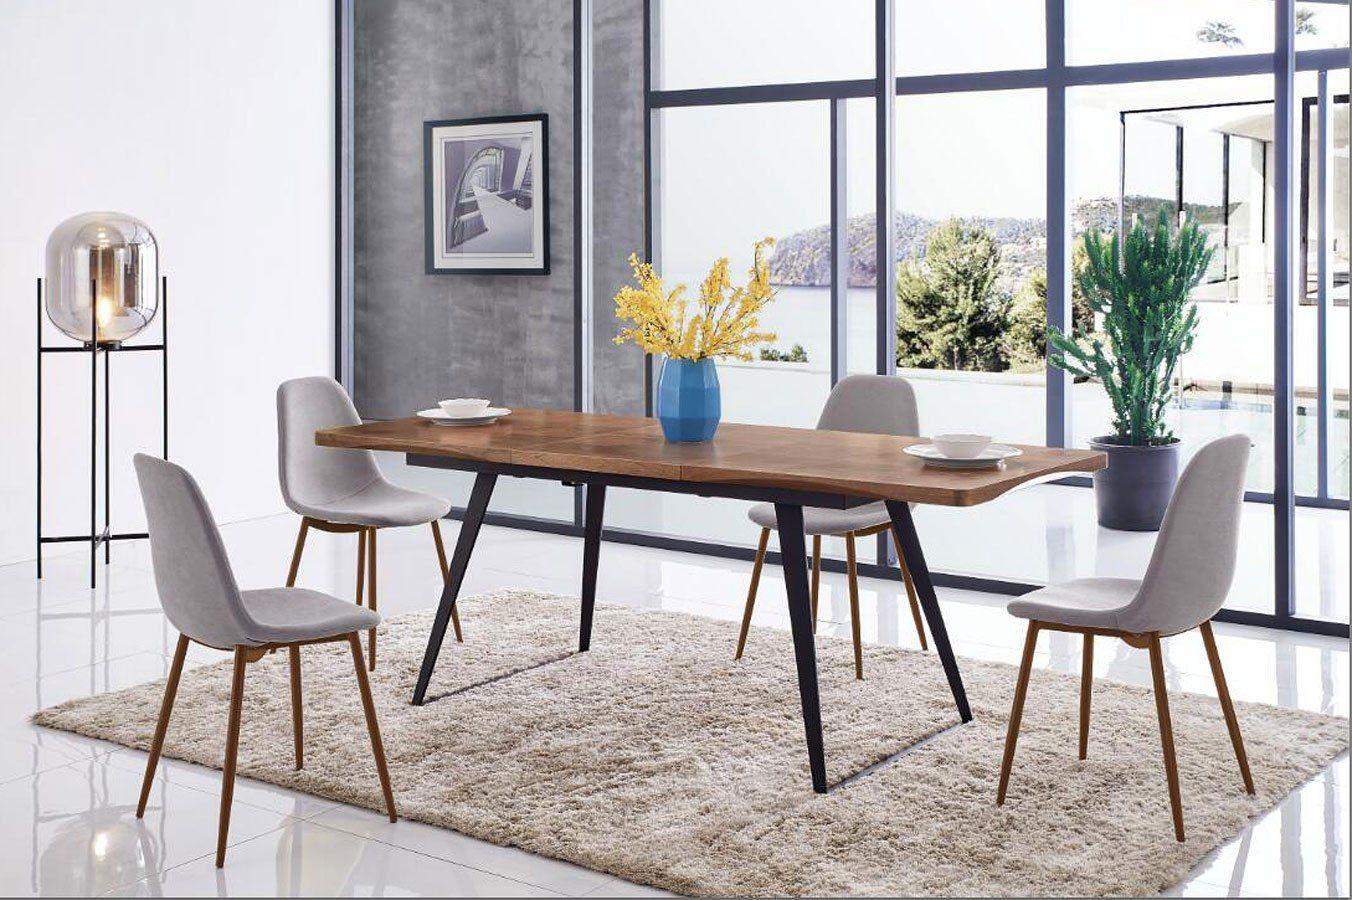 European 93 Extension Dining Room Set | Dining room sets, Dining table, Italian furniture modern